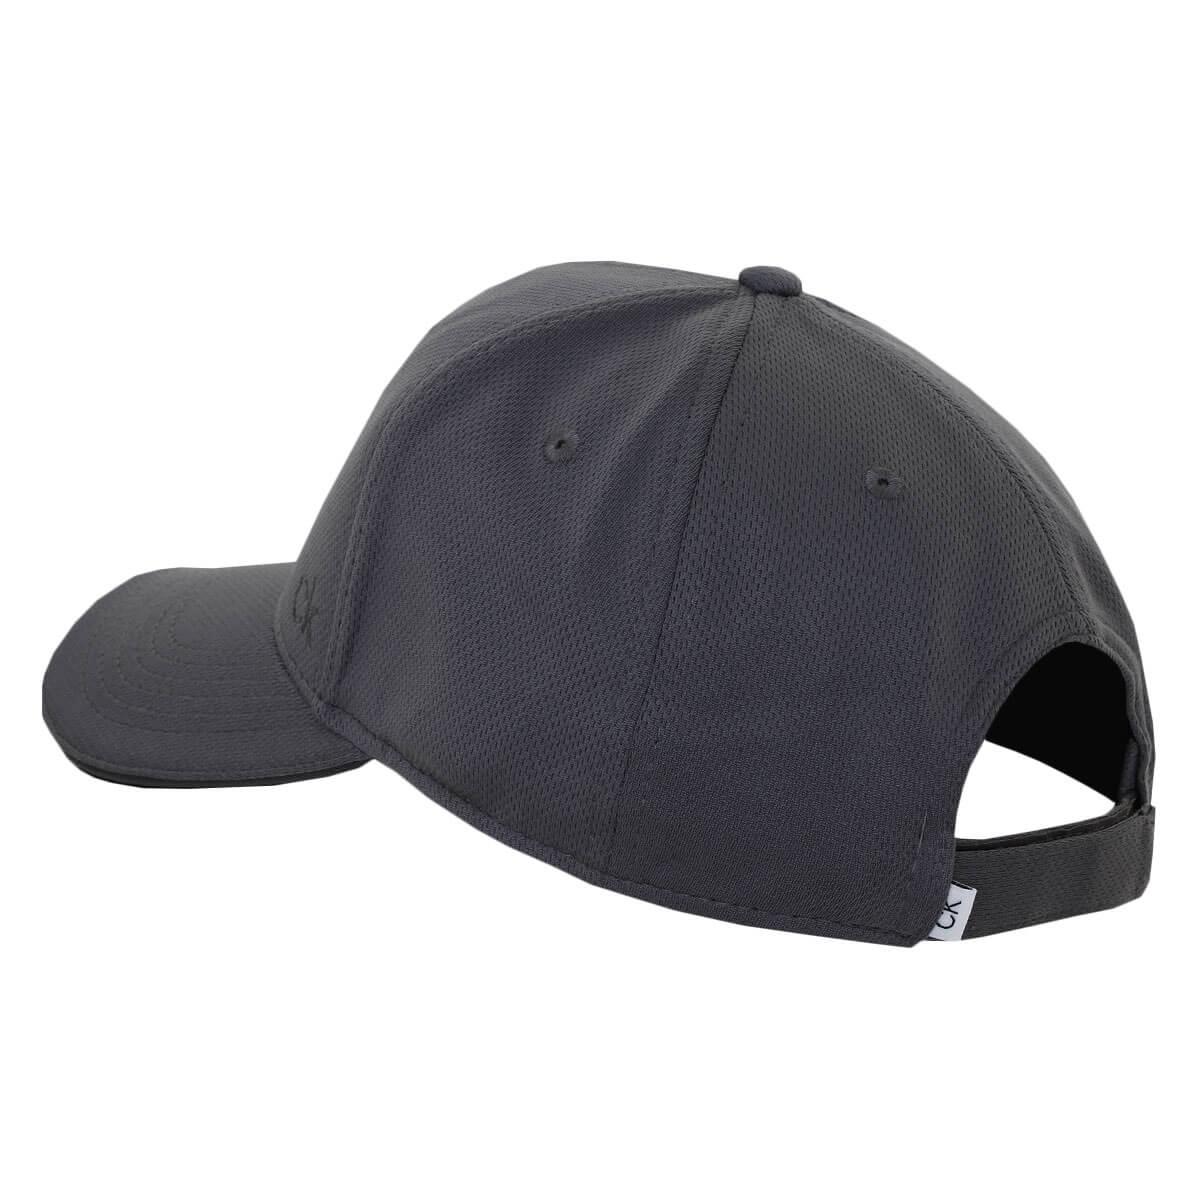 Calvin-Klein-Golf-2019-Airtex-Performance-Adjustable-Quick-Dry-Cap-40-OFF-RRP thumbnail 9